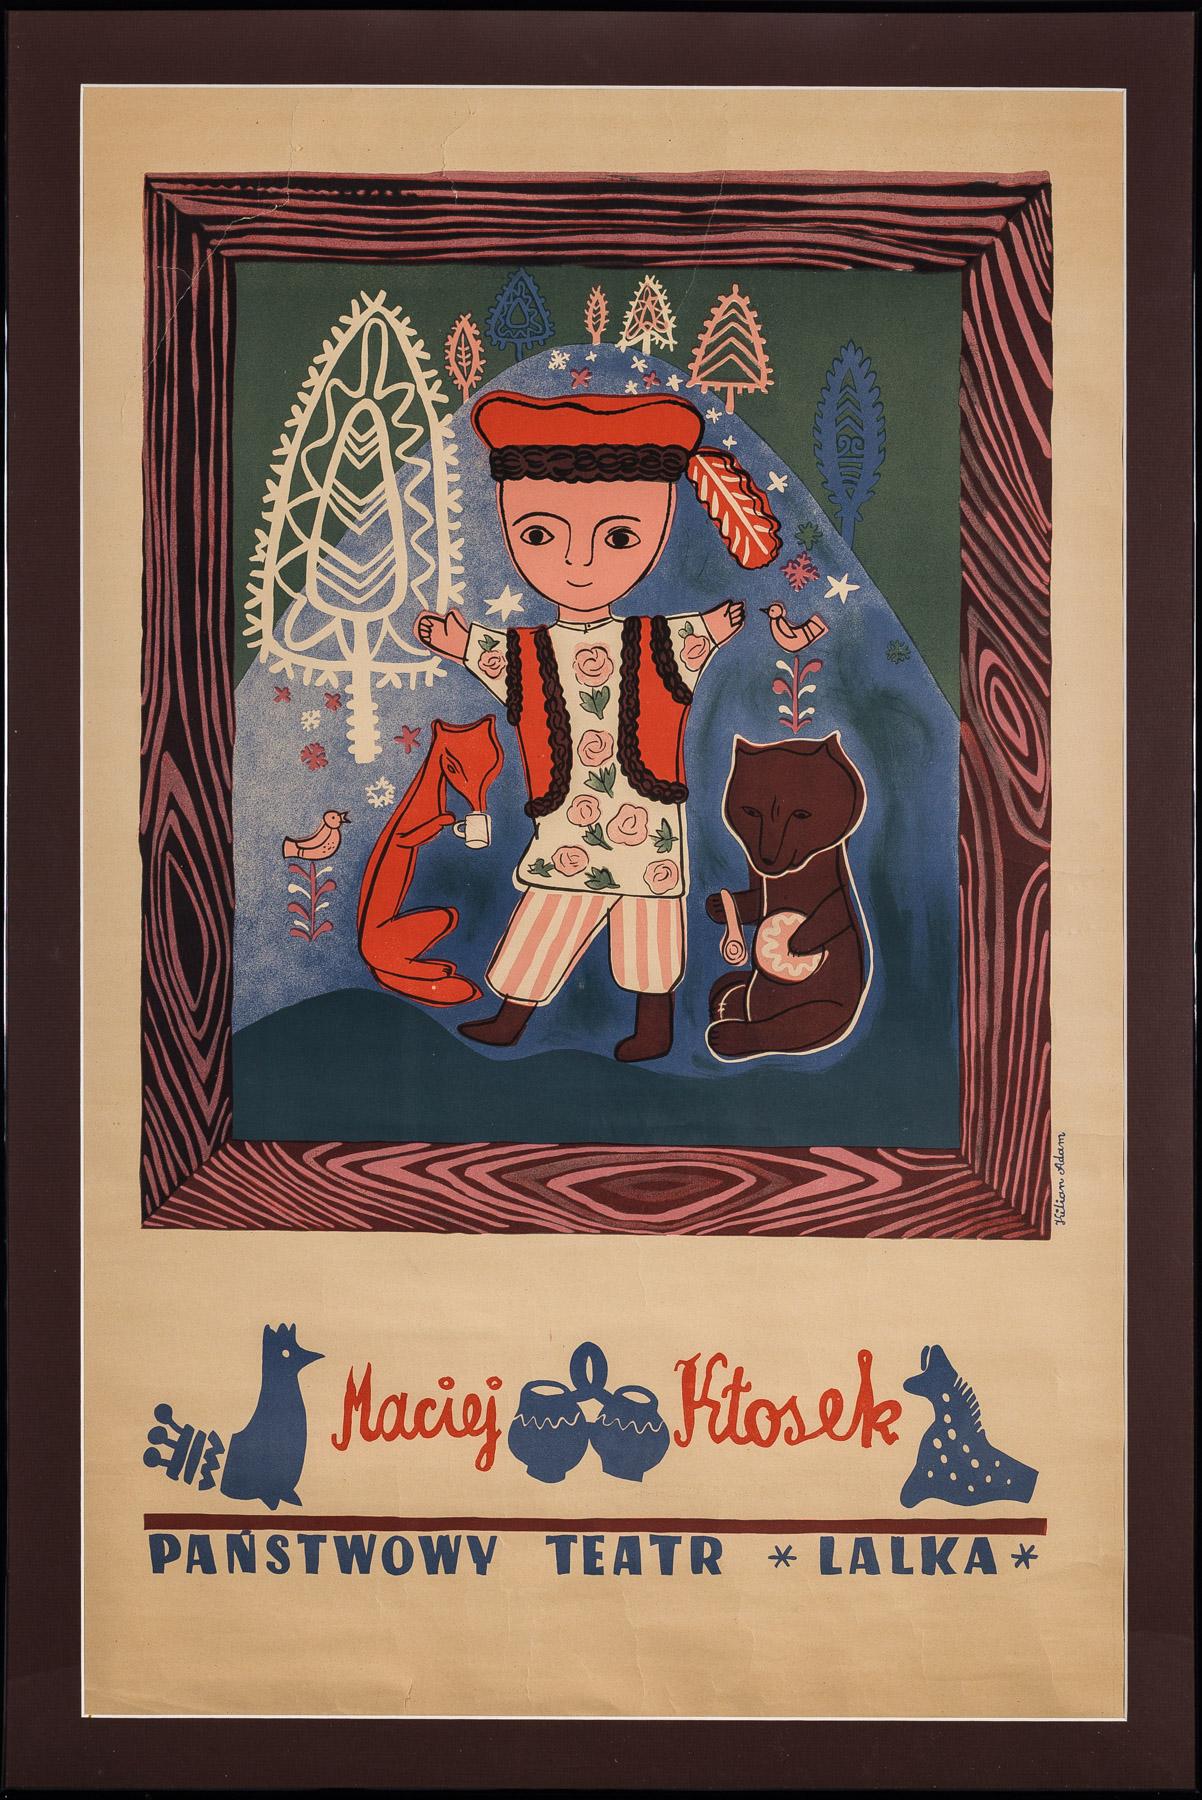 Maciej Kłosek. Państwowy Teatr Lalka, 1951